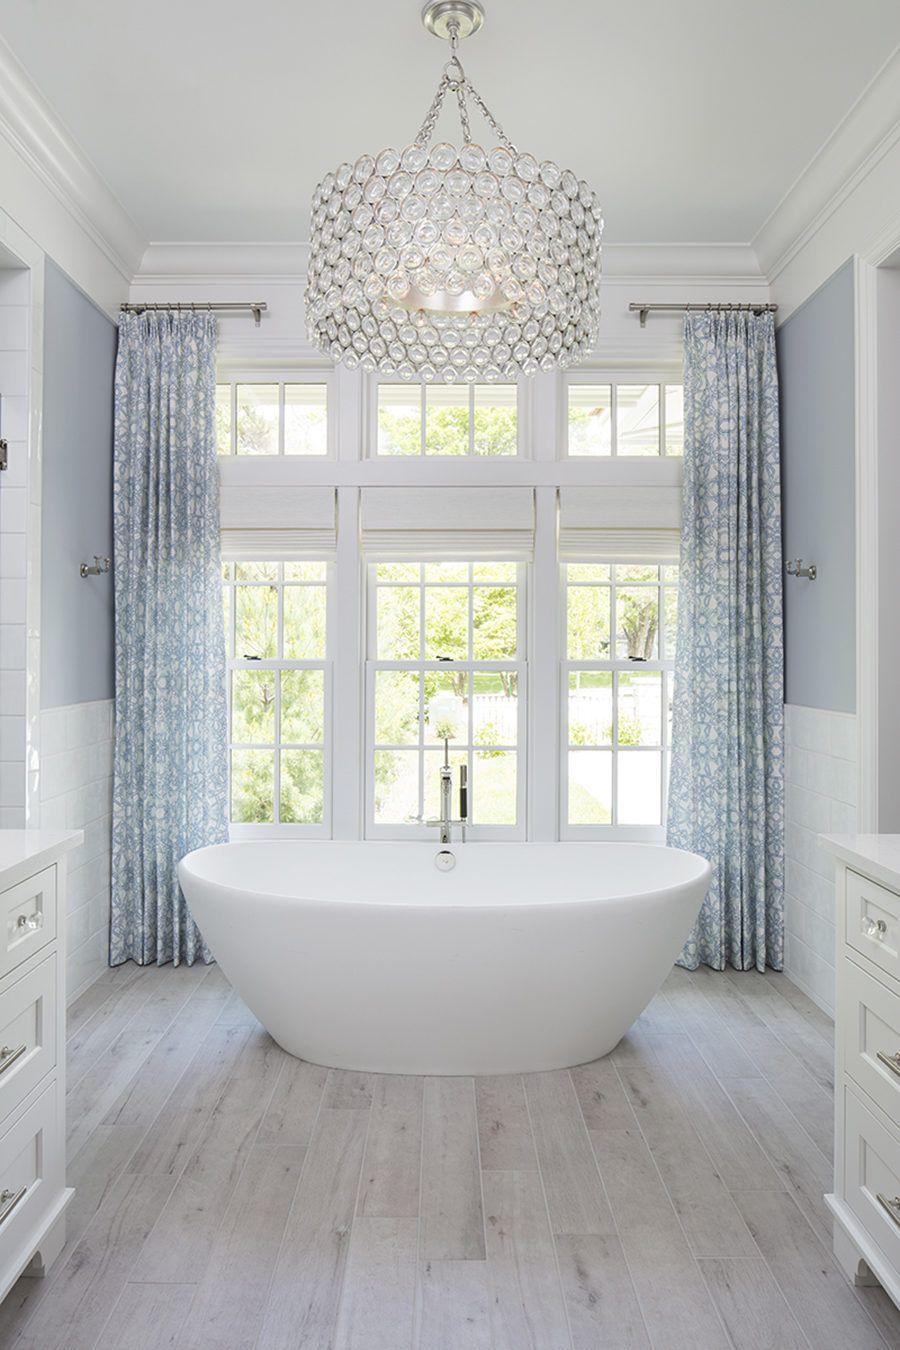 Read More Https Www Stylemepretty Com Vault Image 7032767 Dream Bathrooms Elegant Bathroom Crystal Bathroom